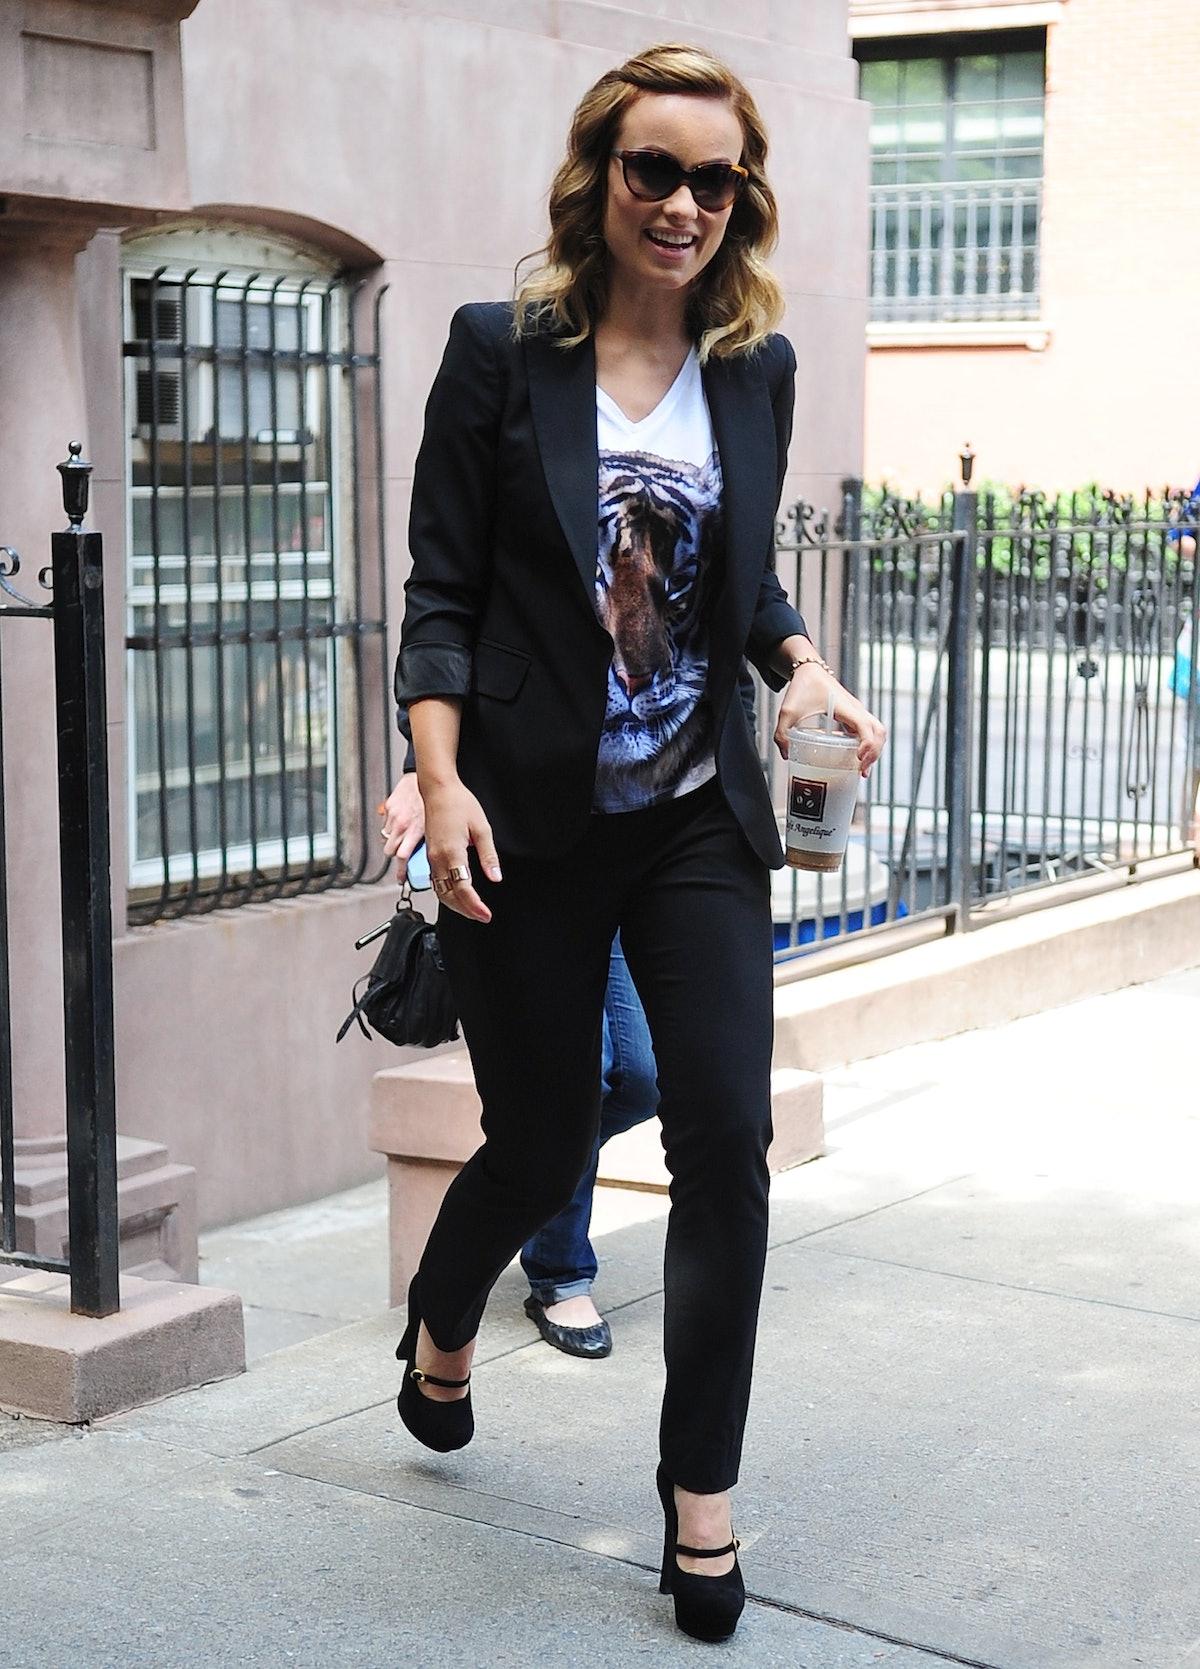 Celebrity Sightings In New York City - June 18, 2012